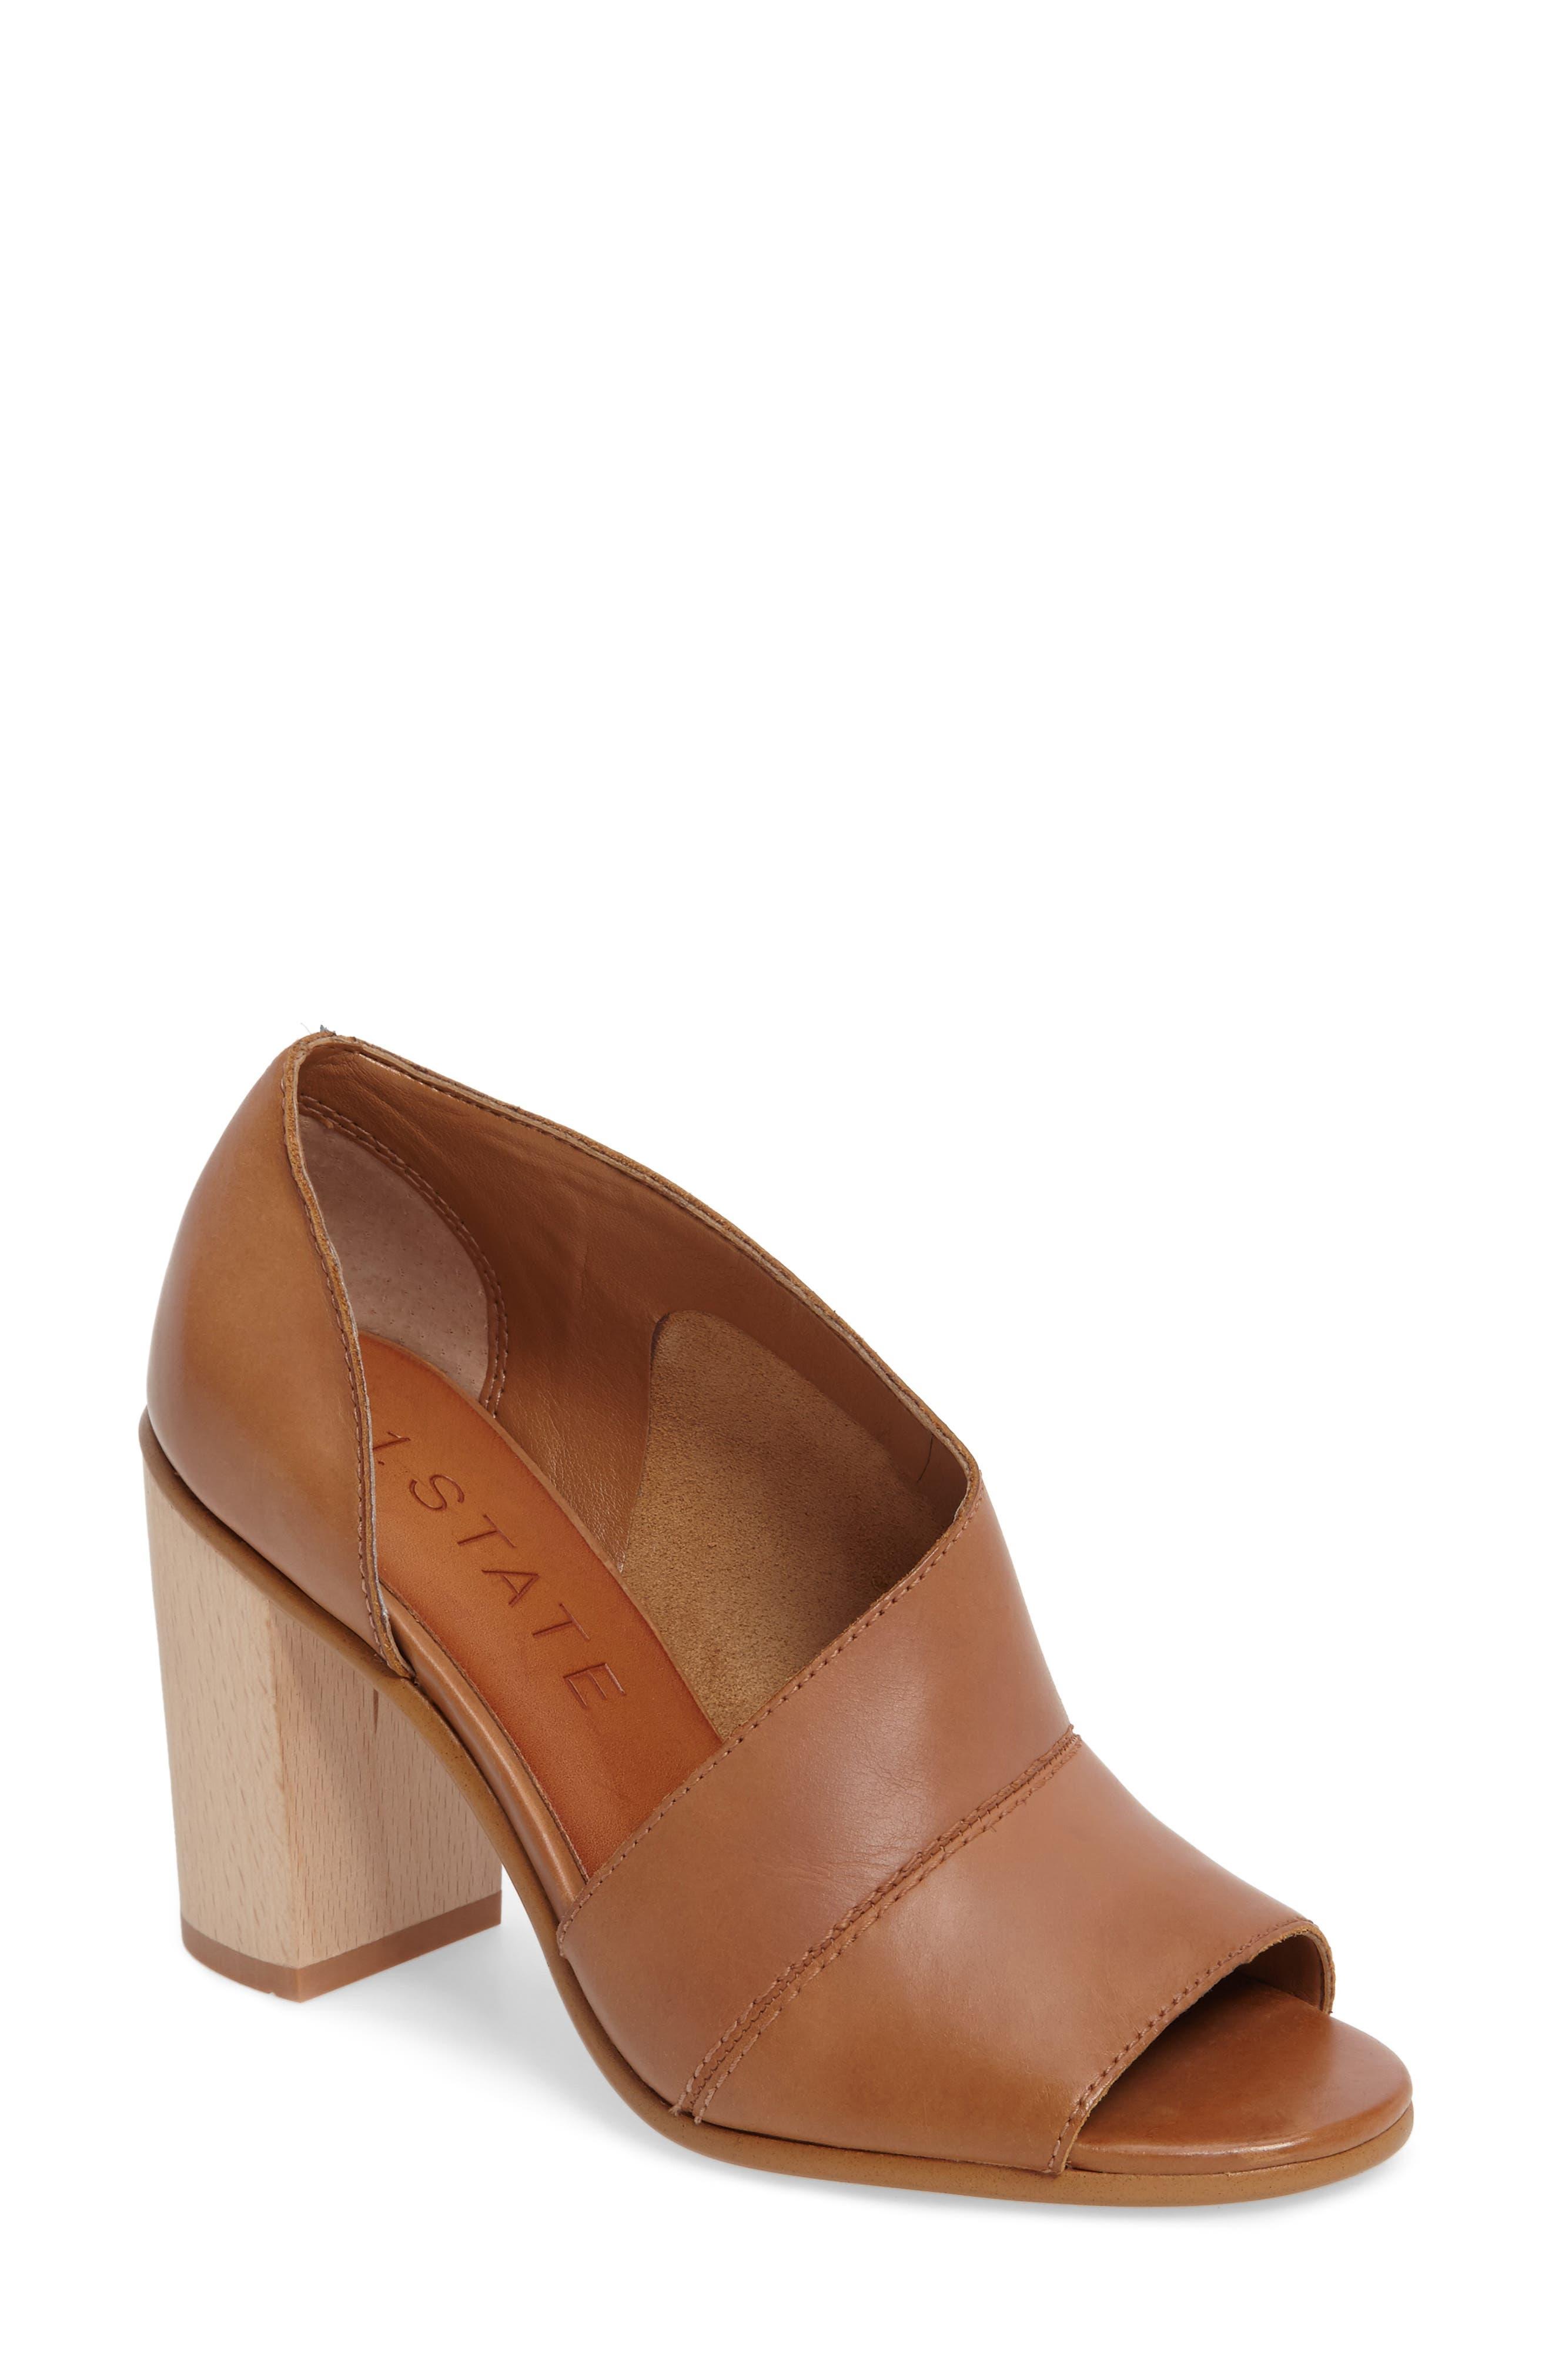 Amble Asymmetrical Sandal,                         Main,                         color, Tan Leather